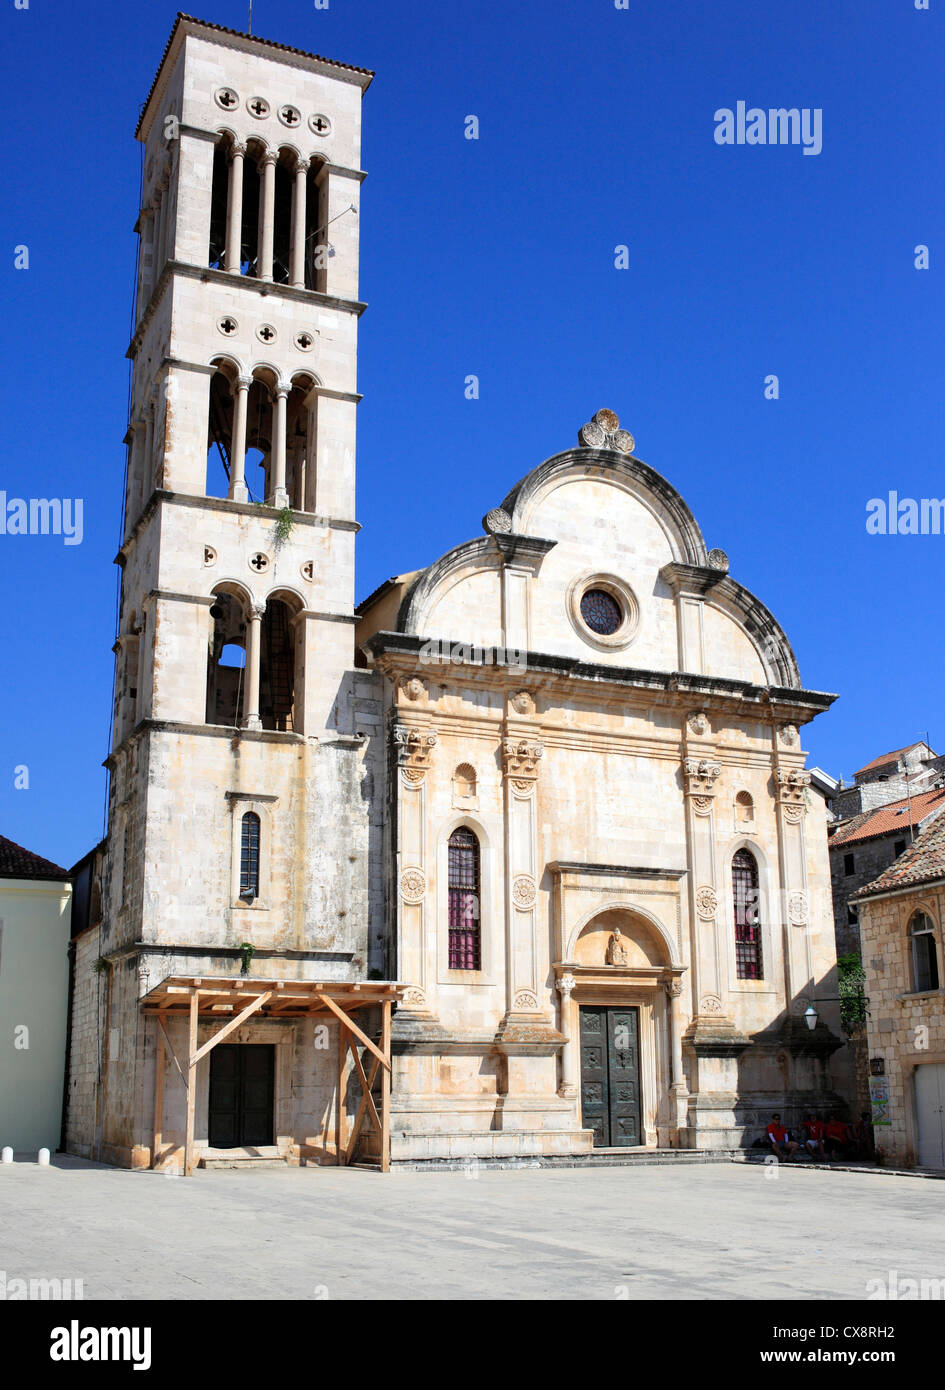 Cathedral of Sv. Stjepan (St. Stephen), central square (Pjaca), city of Hvar, Island of Hvar, Dalmatian coast, Croatia - Stock Image